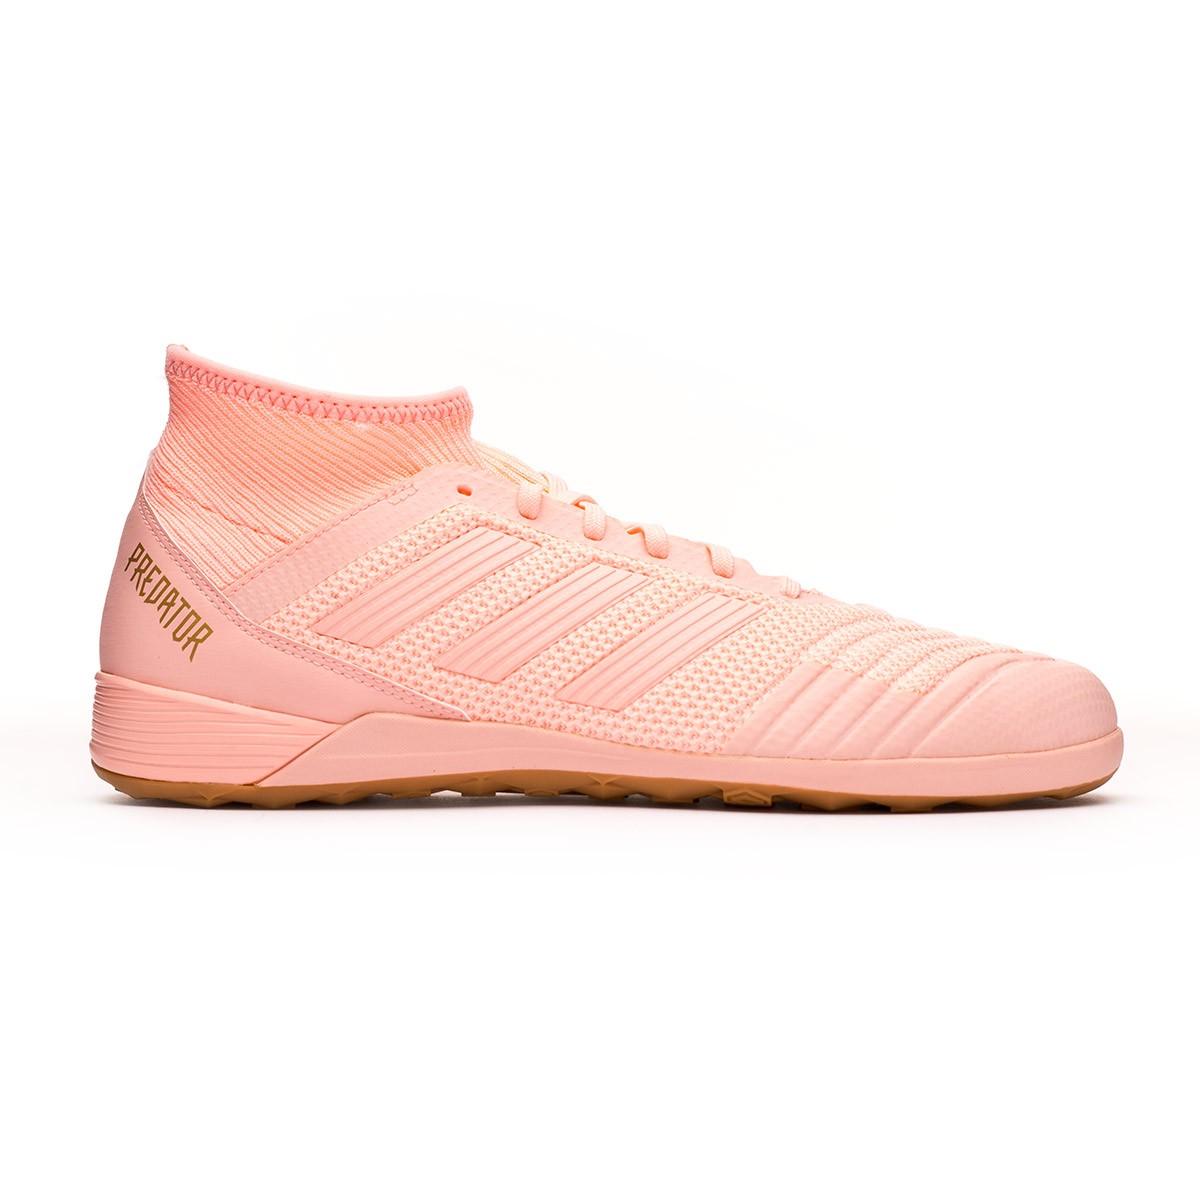 info for 86e8b 1e4fa Futsal Boot adidas Predator Tango 18.3 IN Clear orange-Gold metallic -  Football store Fútbol Emotion